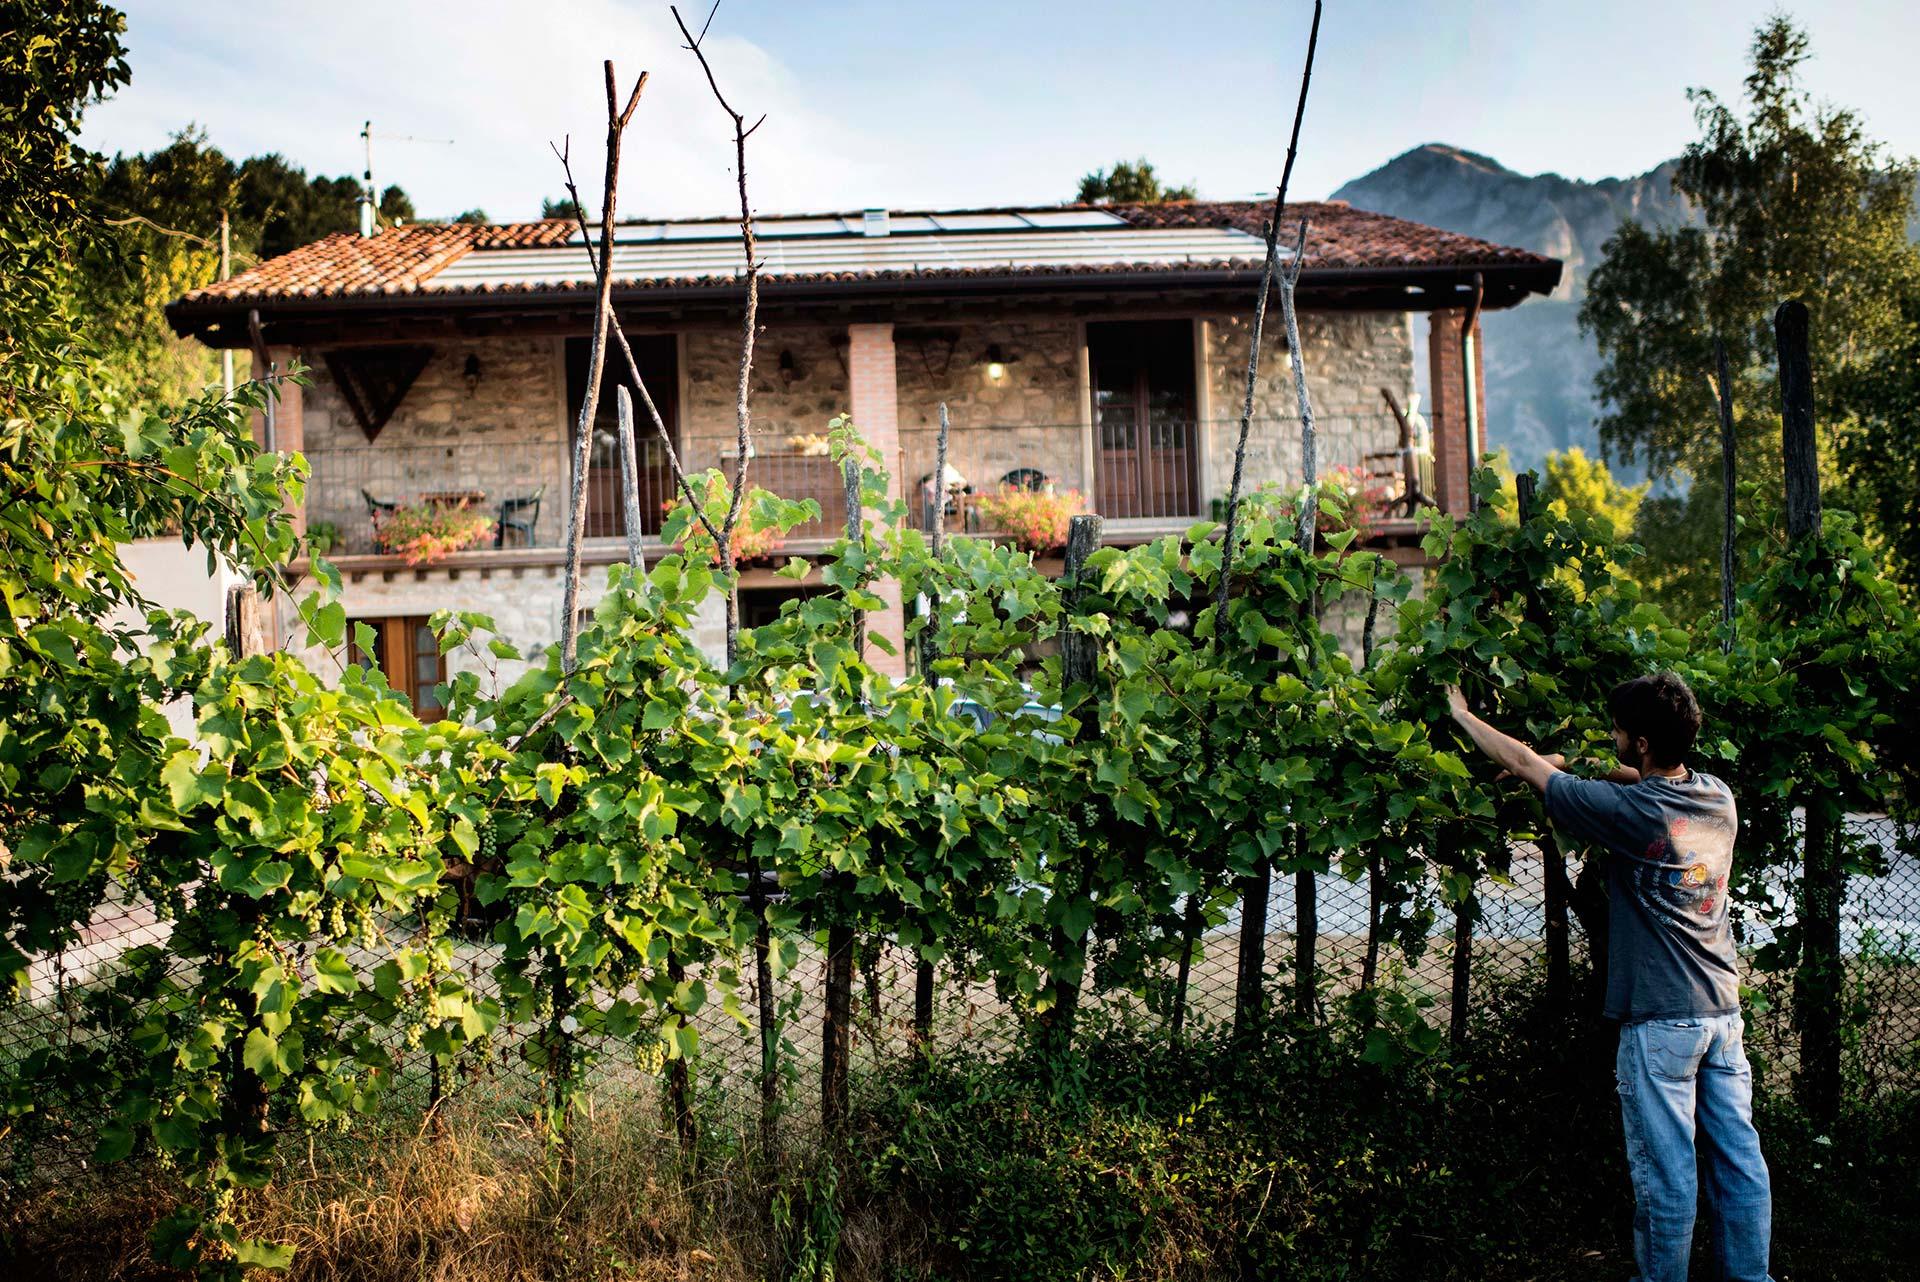 Digitalisasi, Beragam Pertanian, dan Ketahanan Pedesaan di Italia